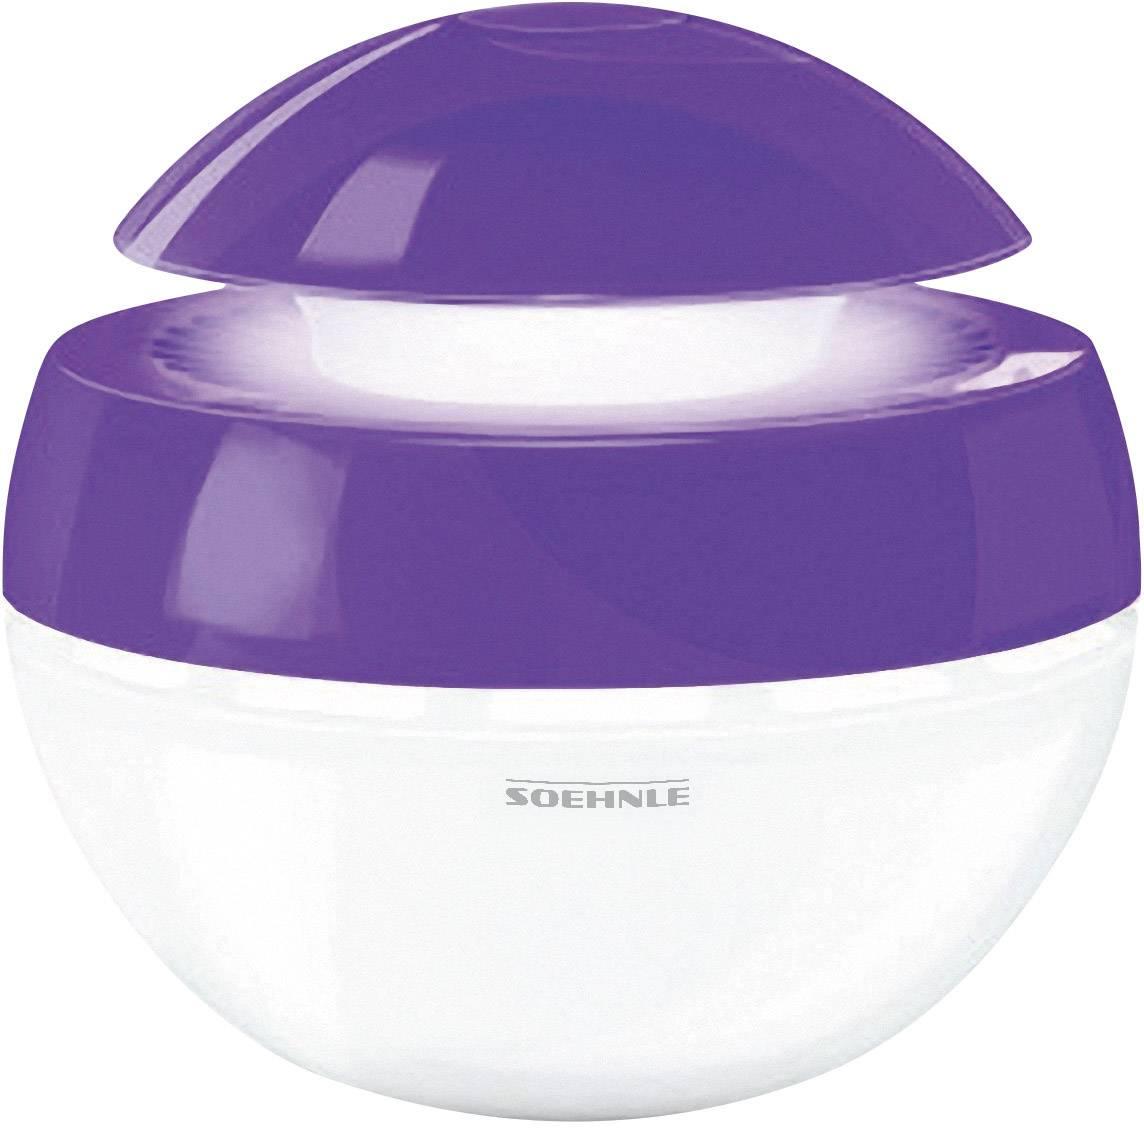 Ultrazuvkový zvlhčovač vzduchu Soehnle Airfresh Plus, 0,15 l/h, biela/fialová